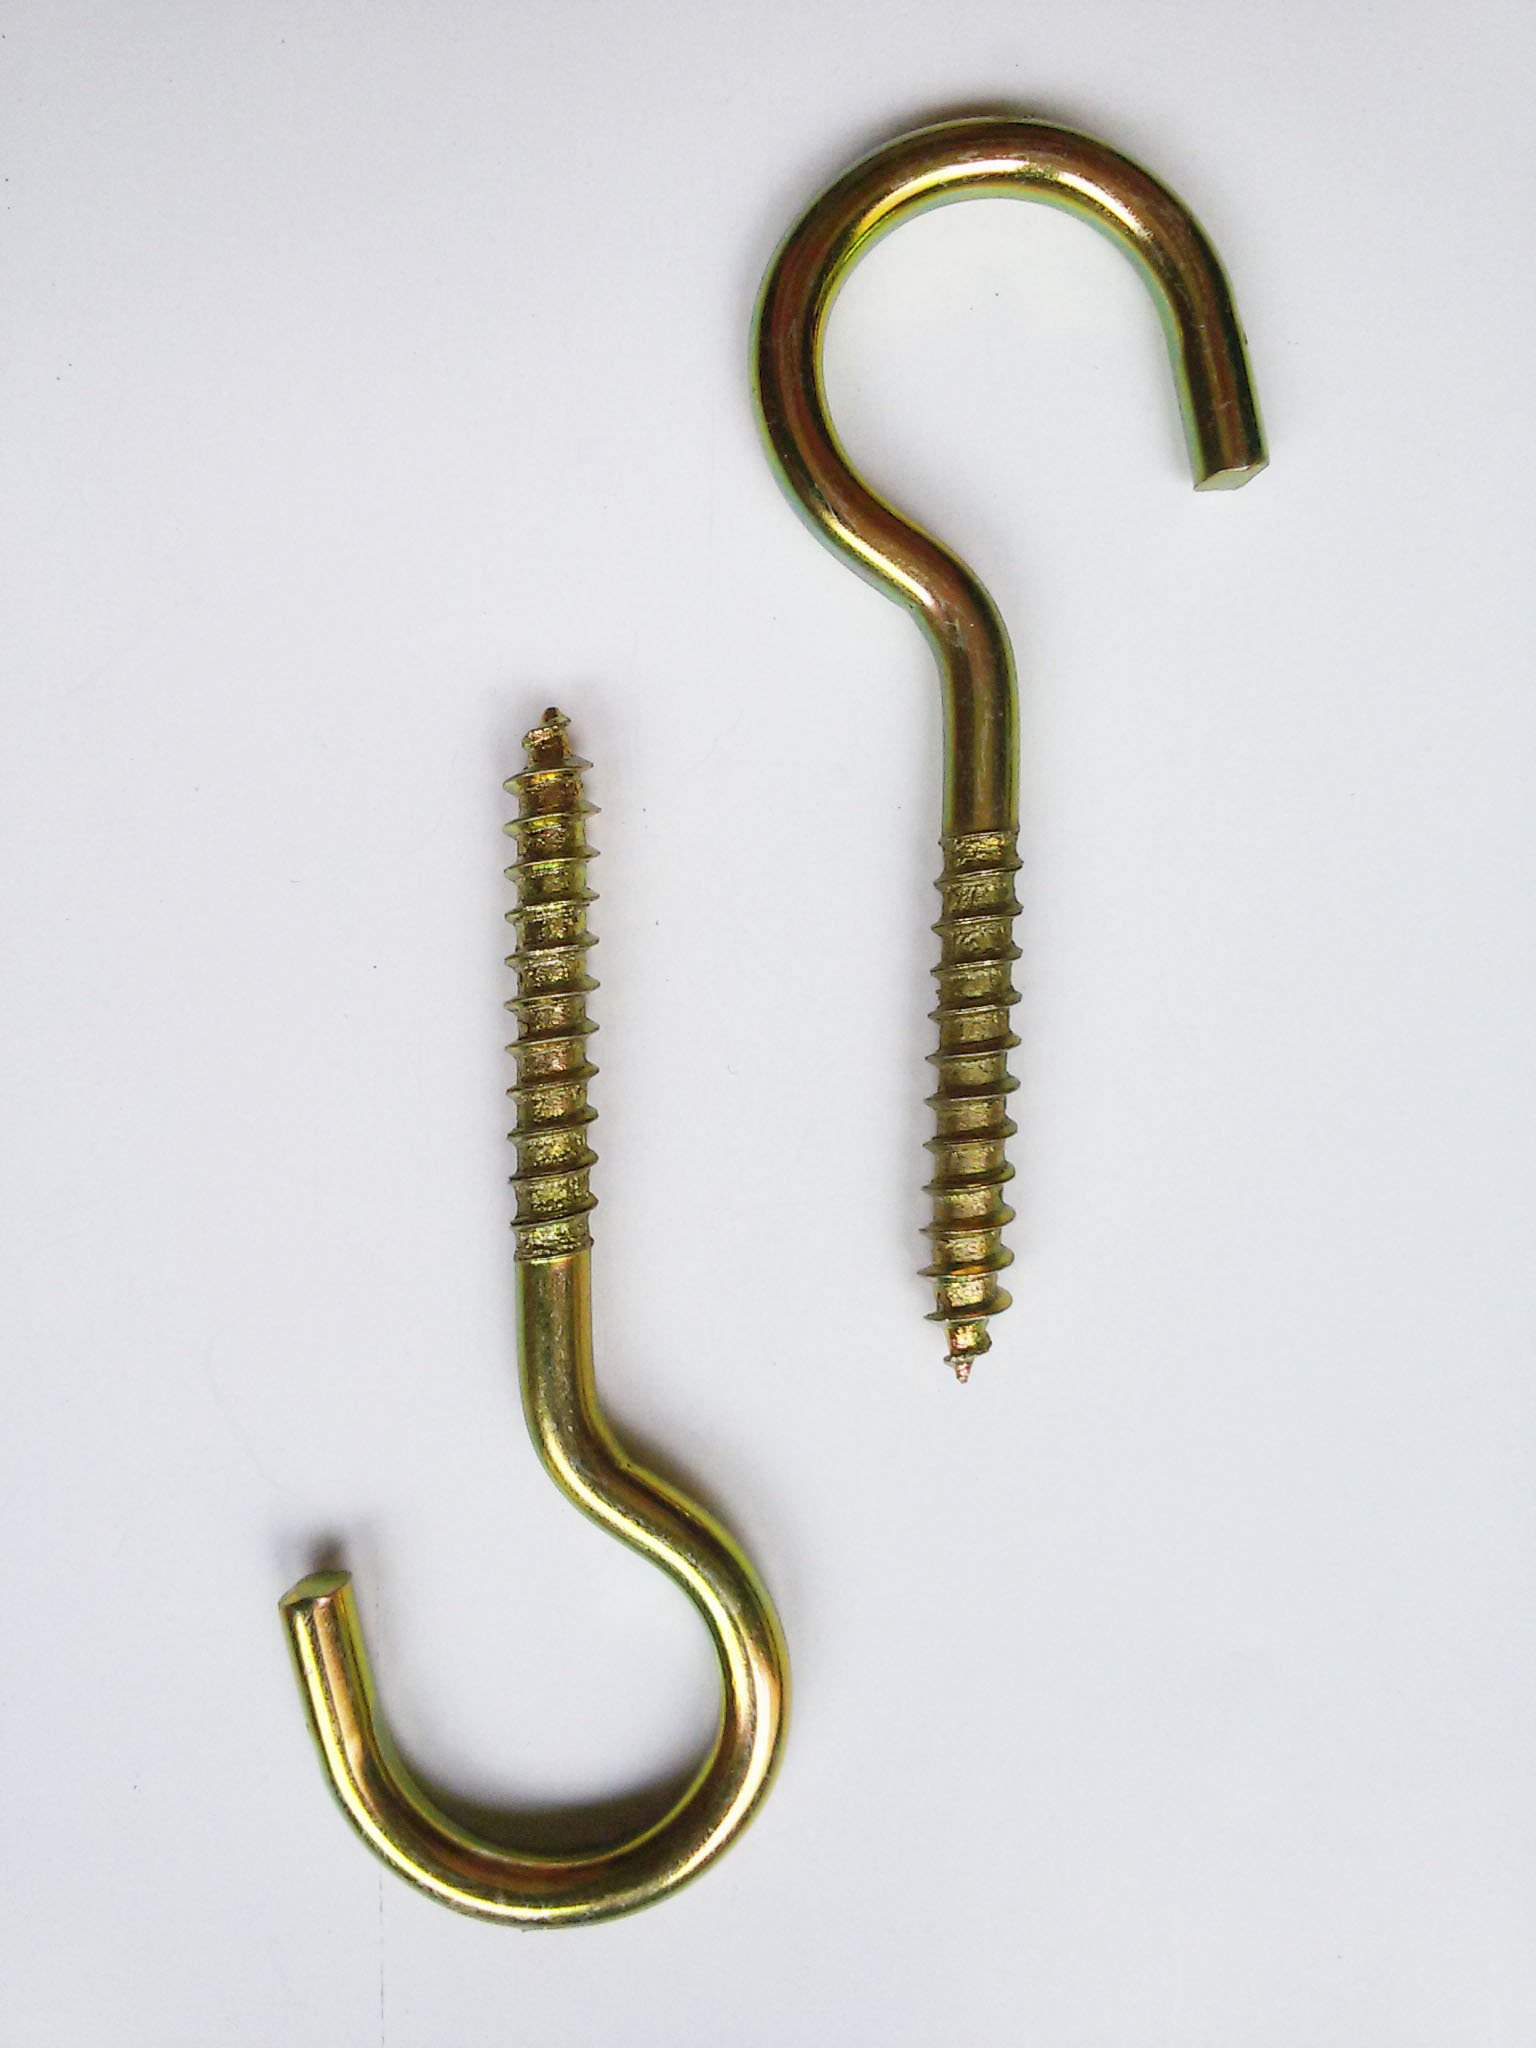 5/16 Inch Lag Eyebolts Thread Eye Screws 10 PCS Zinc Plated Open Shape 50lb